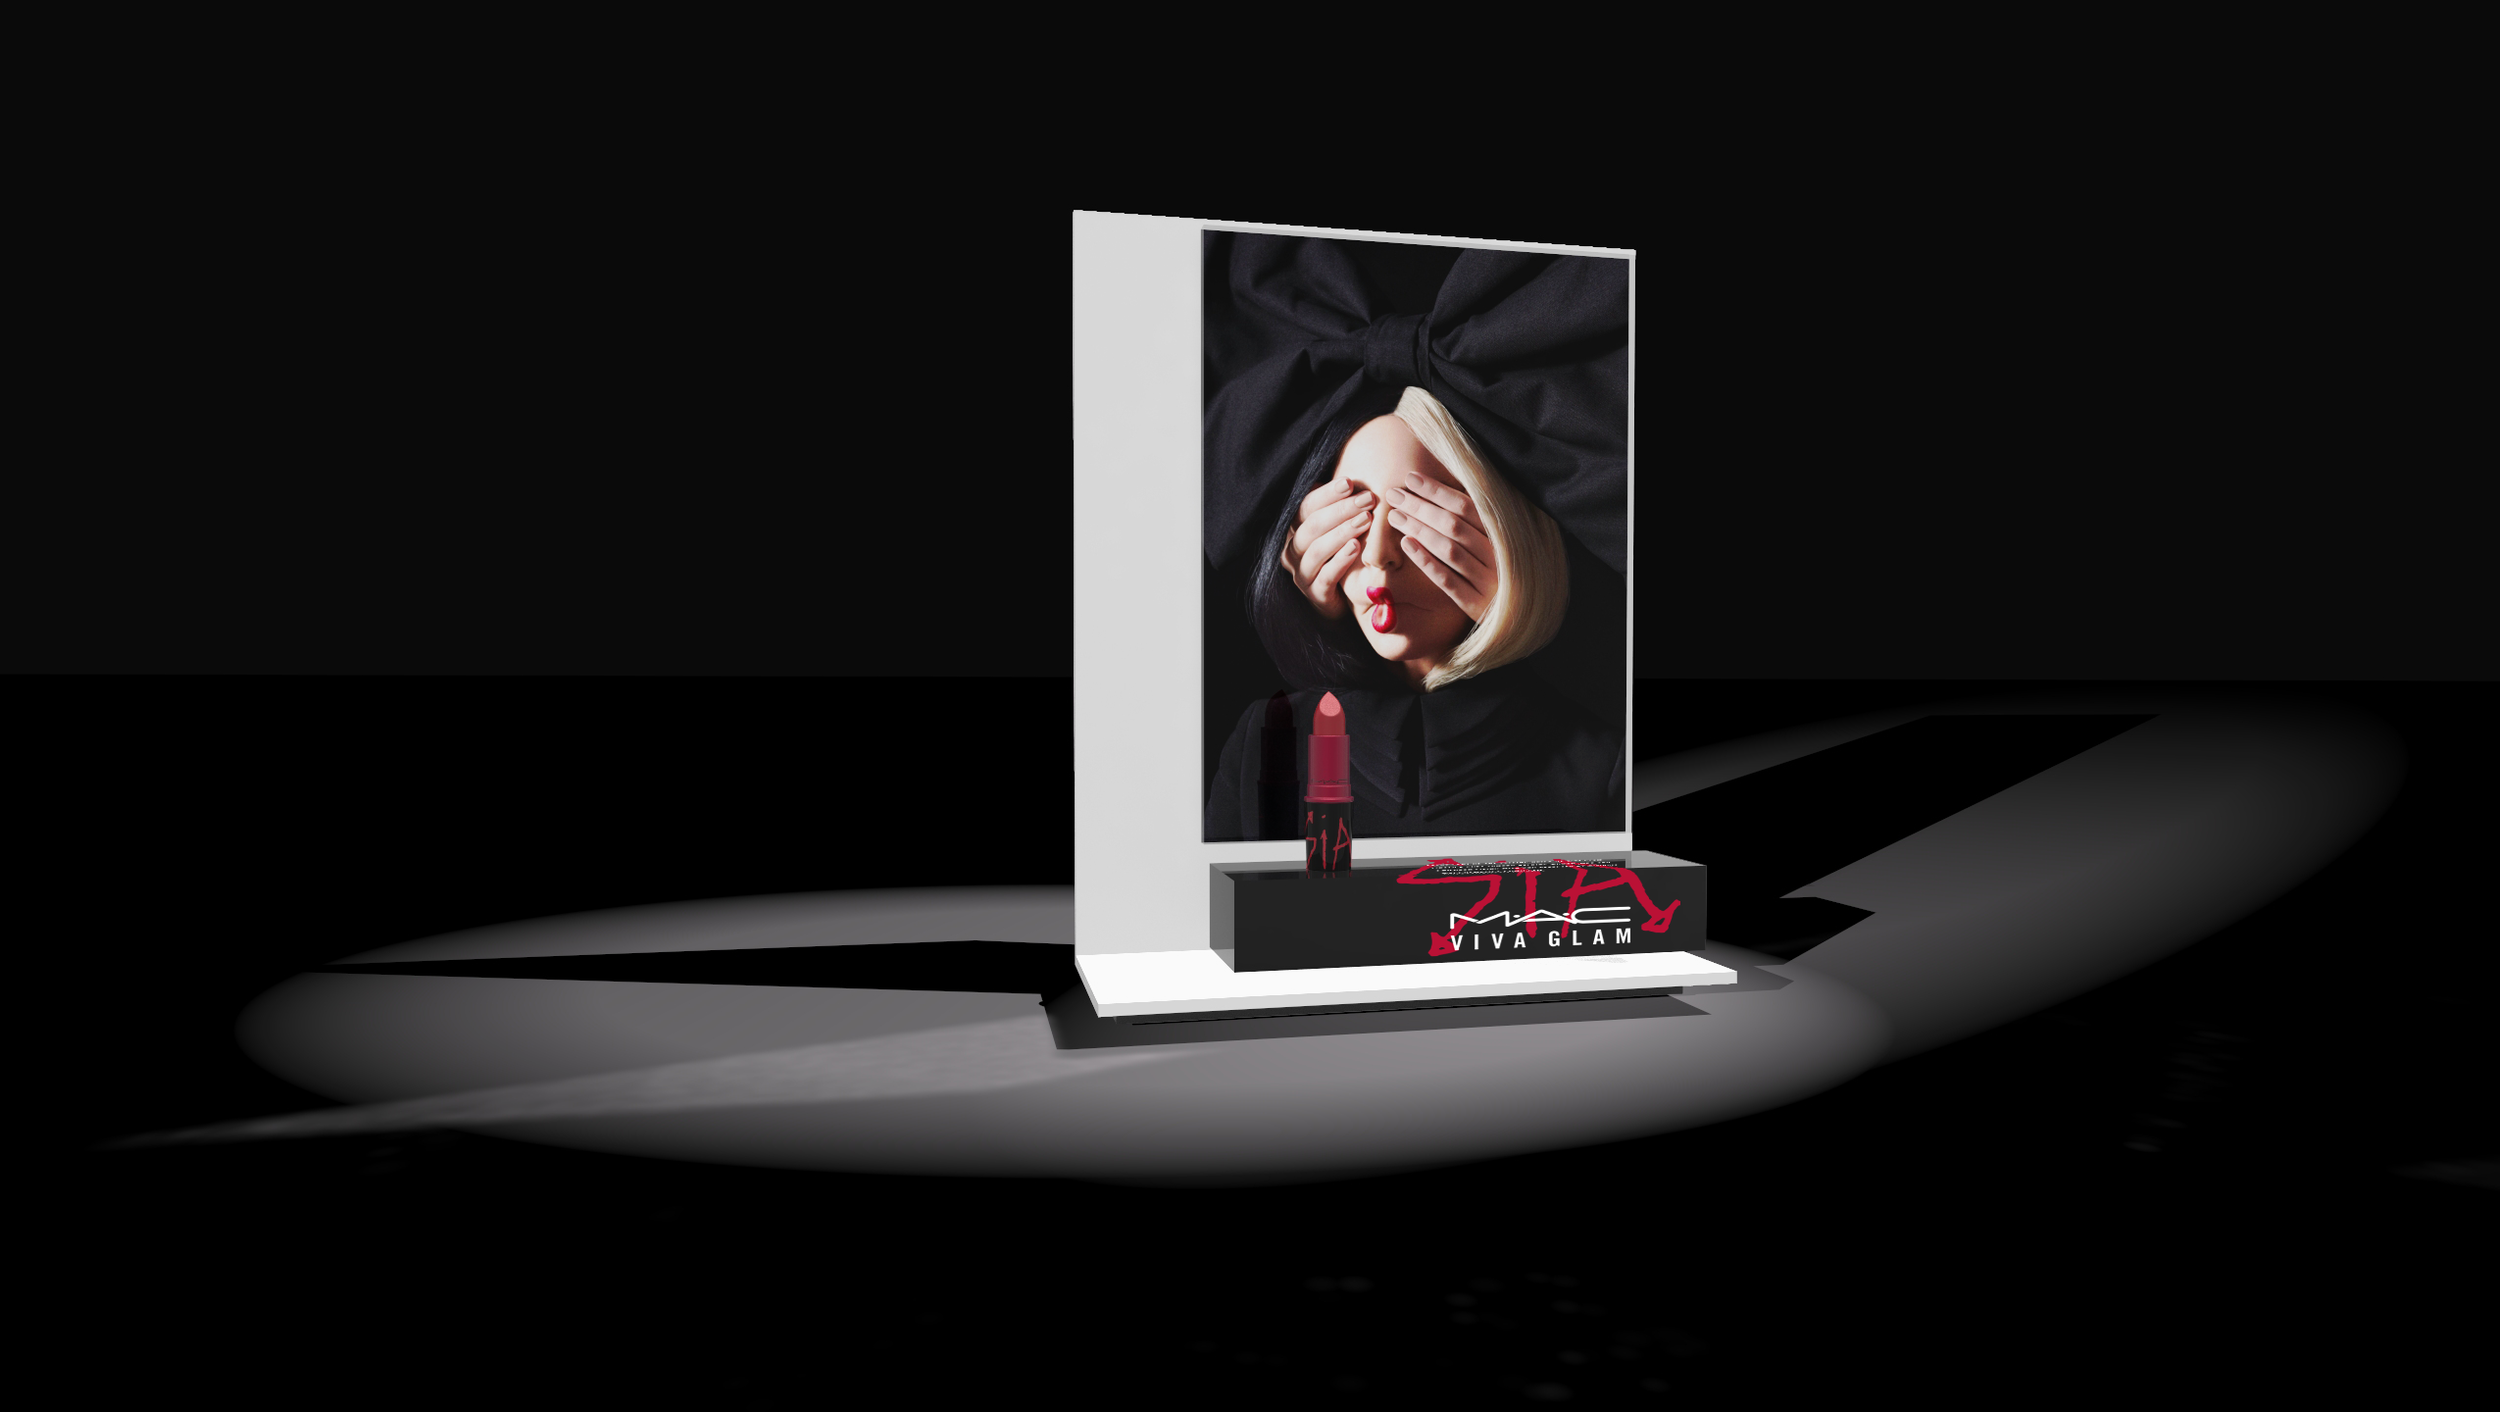 the_wieland_initiative_mac_cosmetics_viva_glam_sia_display_1.png